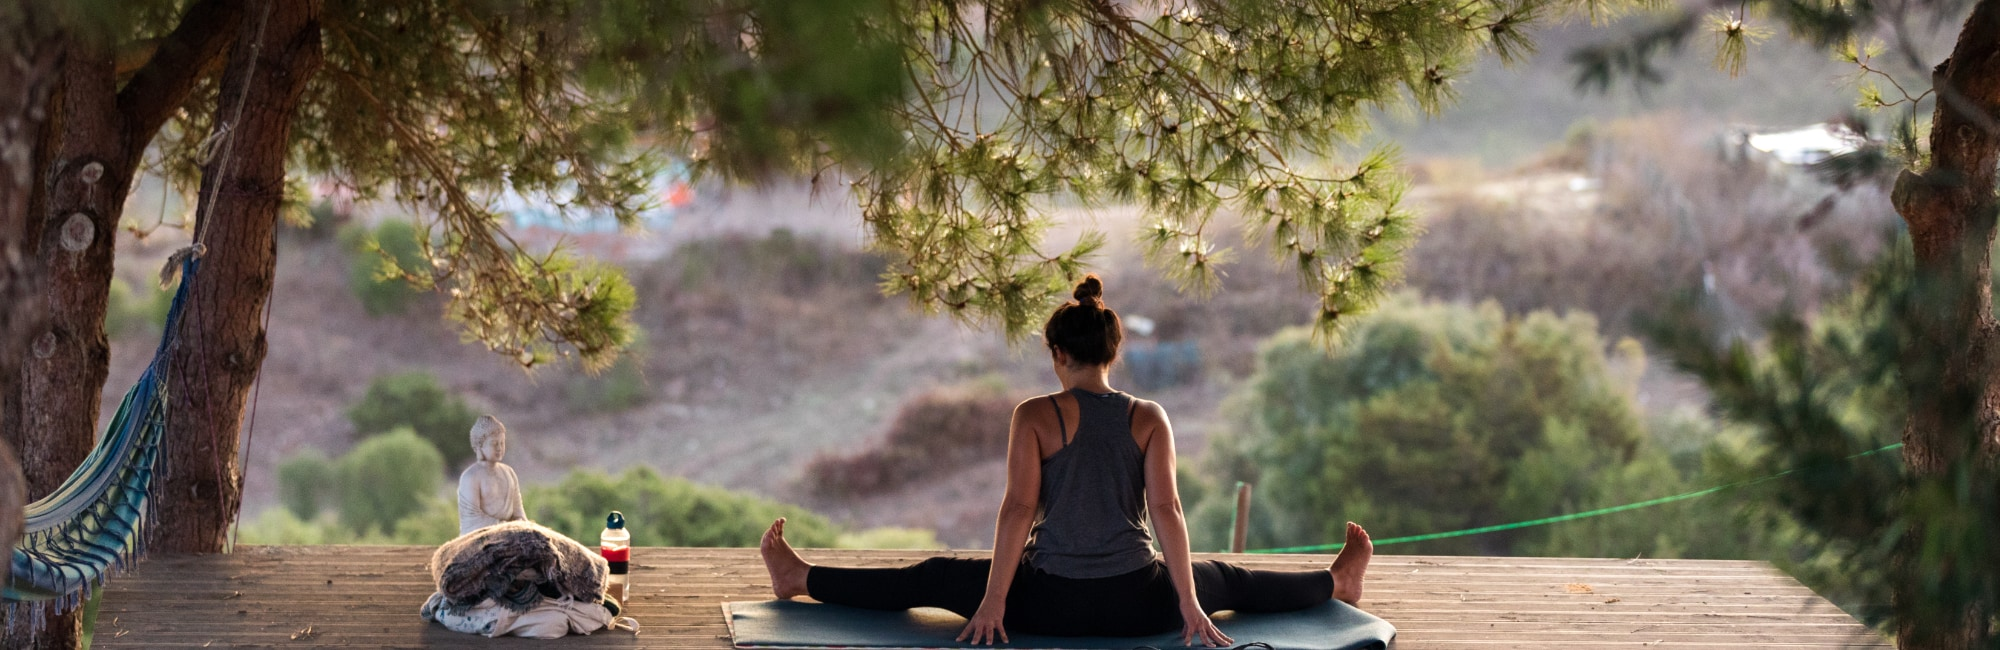 Yoga teacher doing yoga under the trees in south portugal algarve